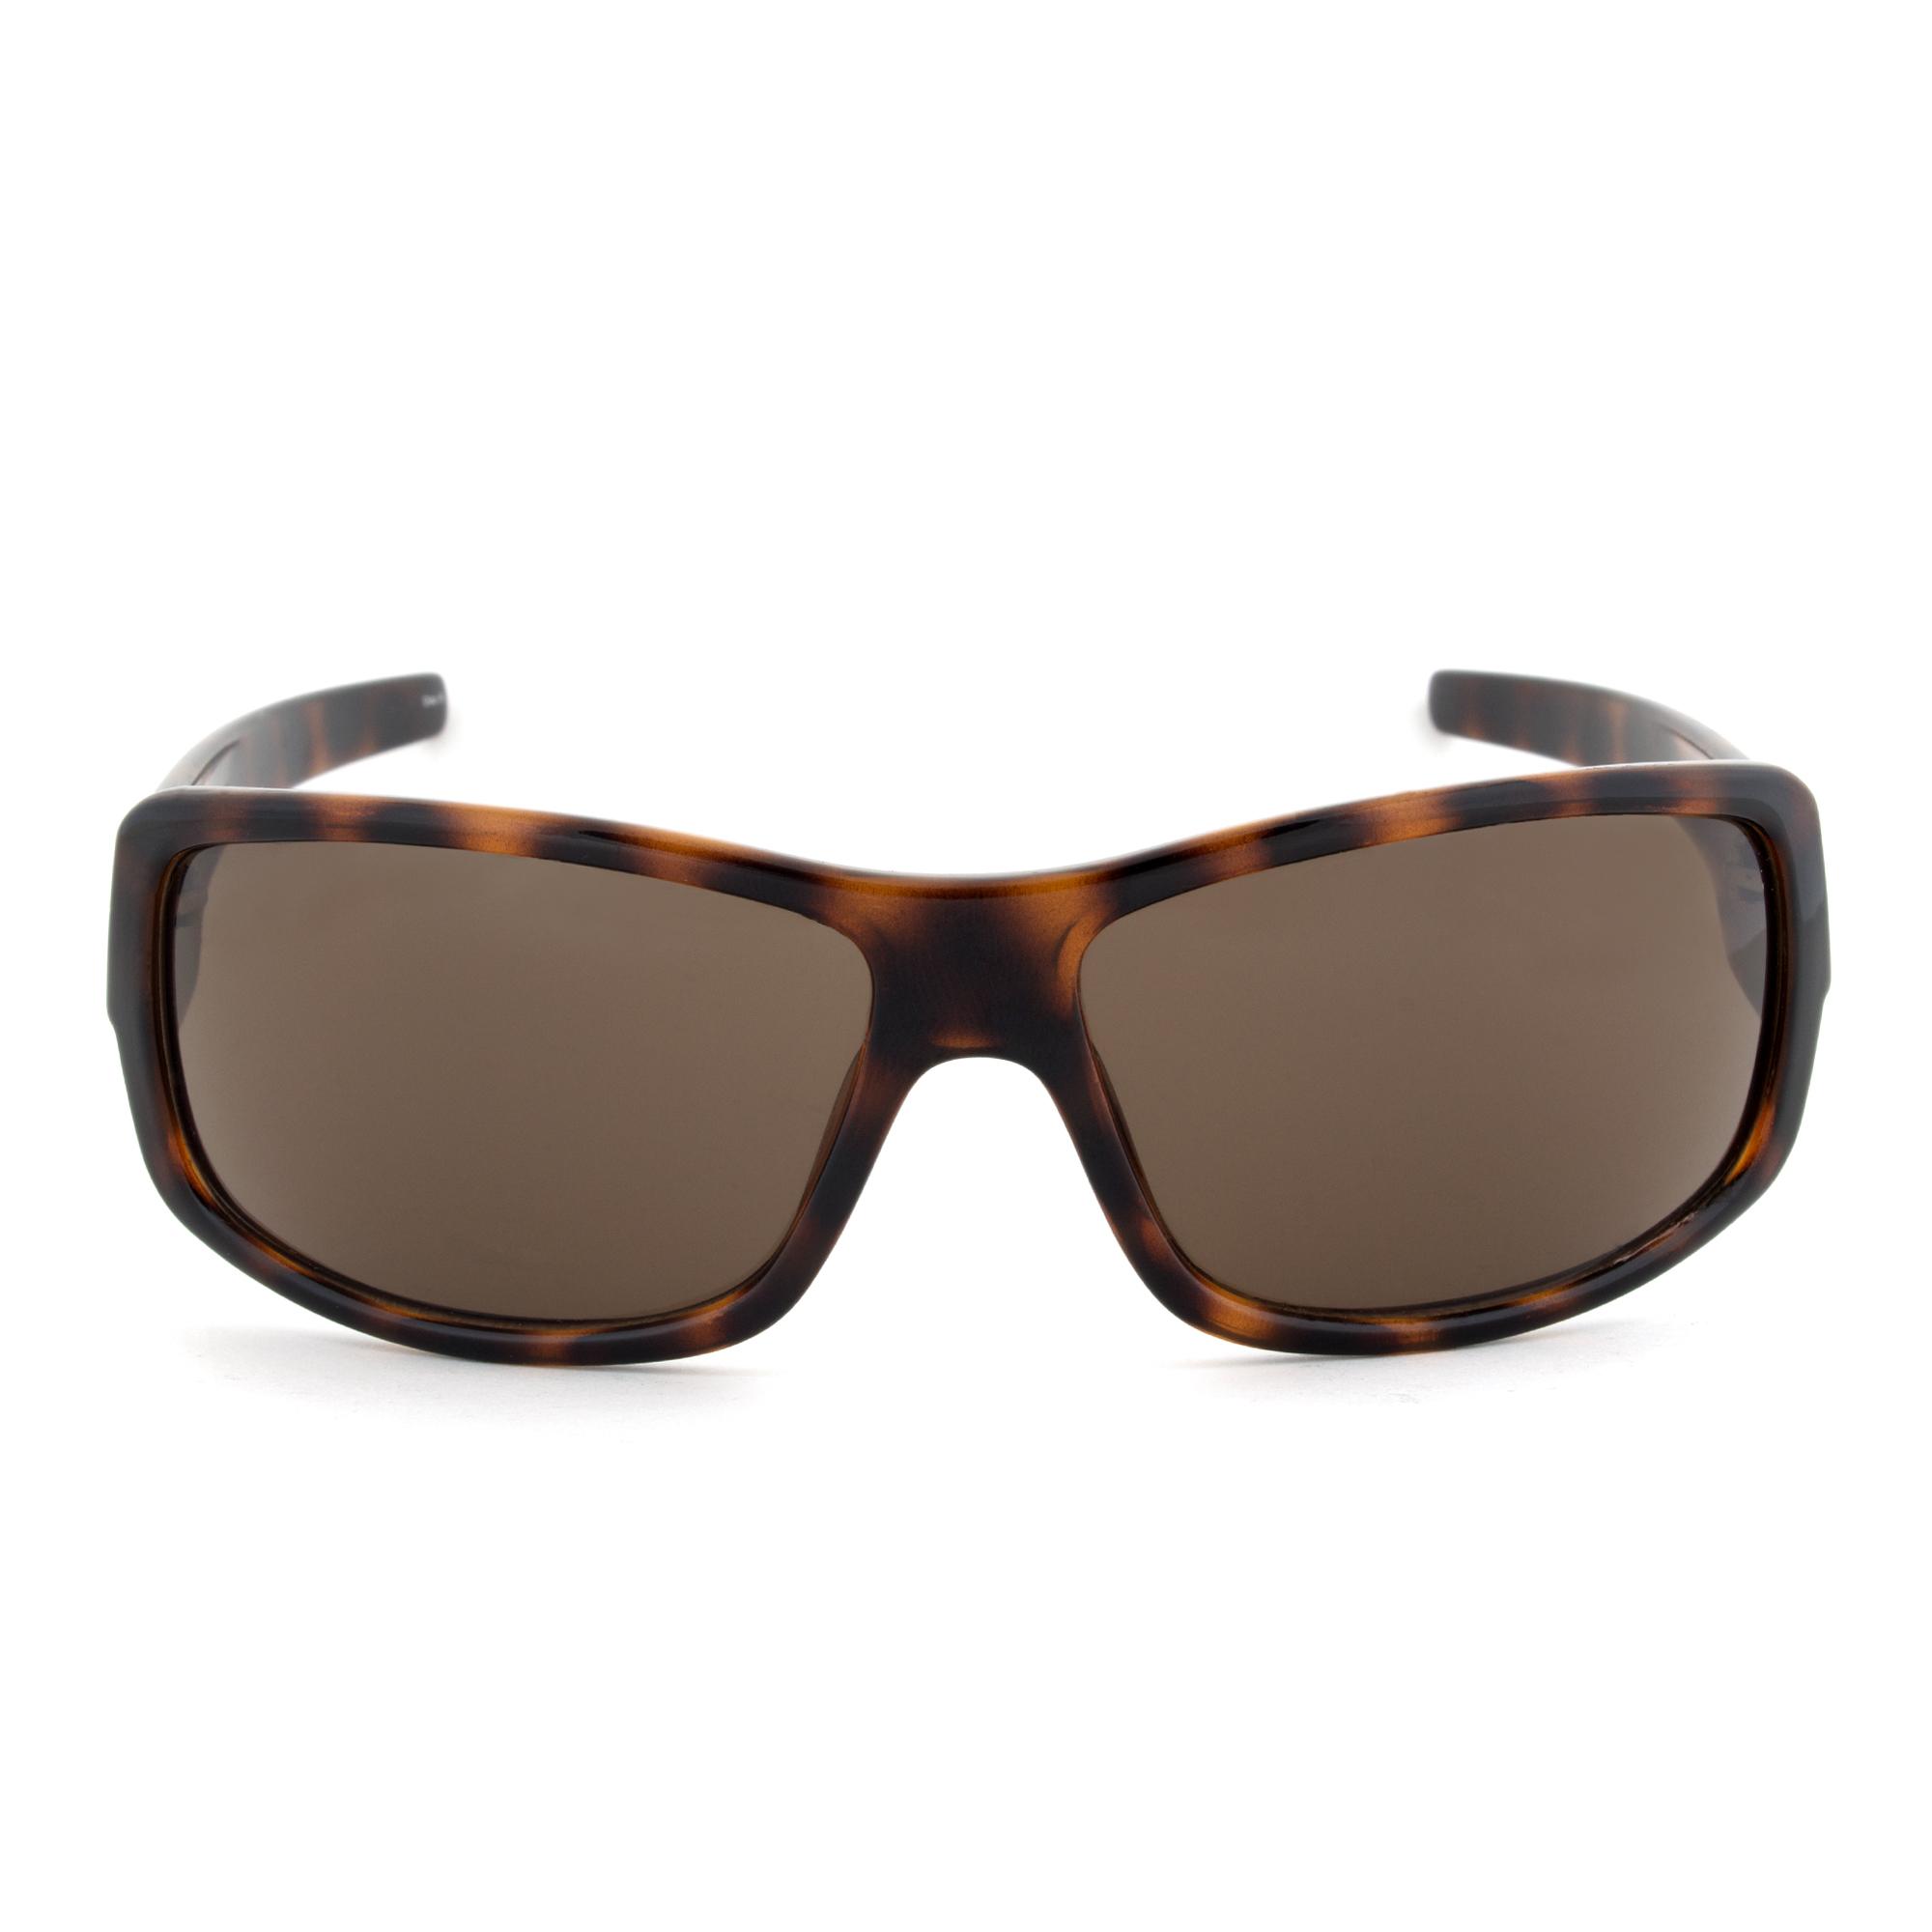 69c52fb206 Timberland Timberland TB7092 52E Rectangular Sunglasses